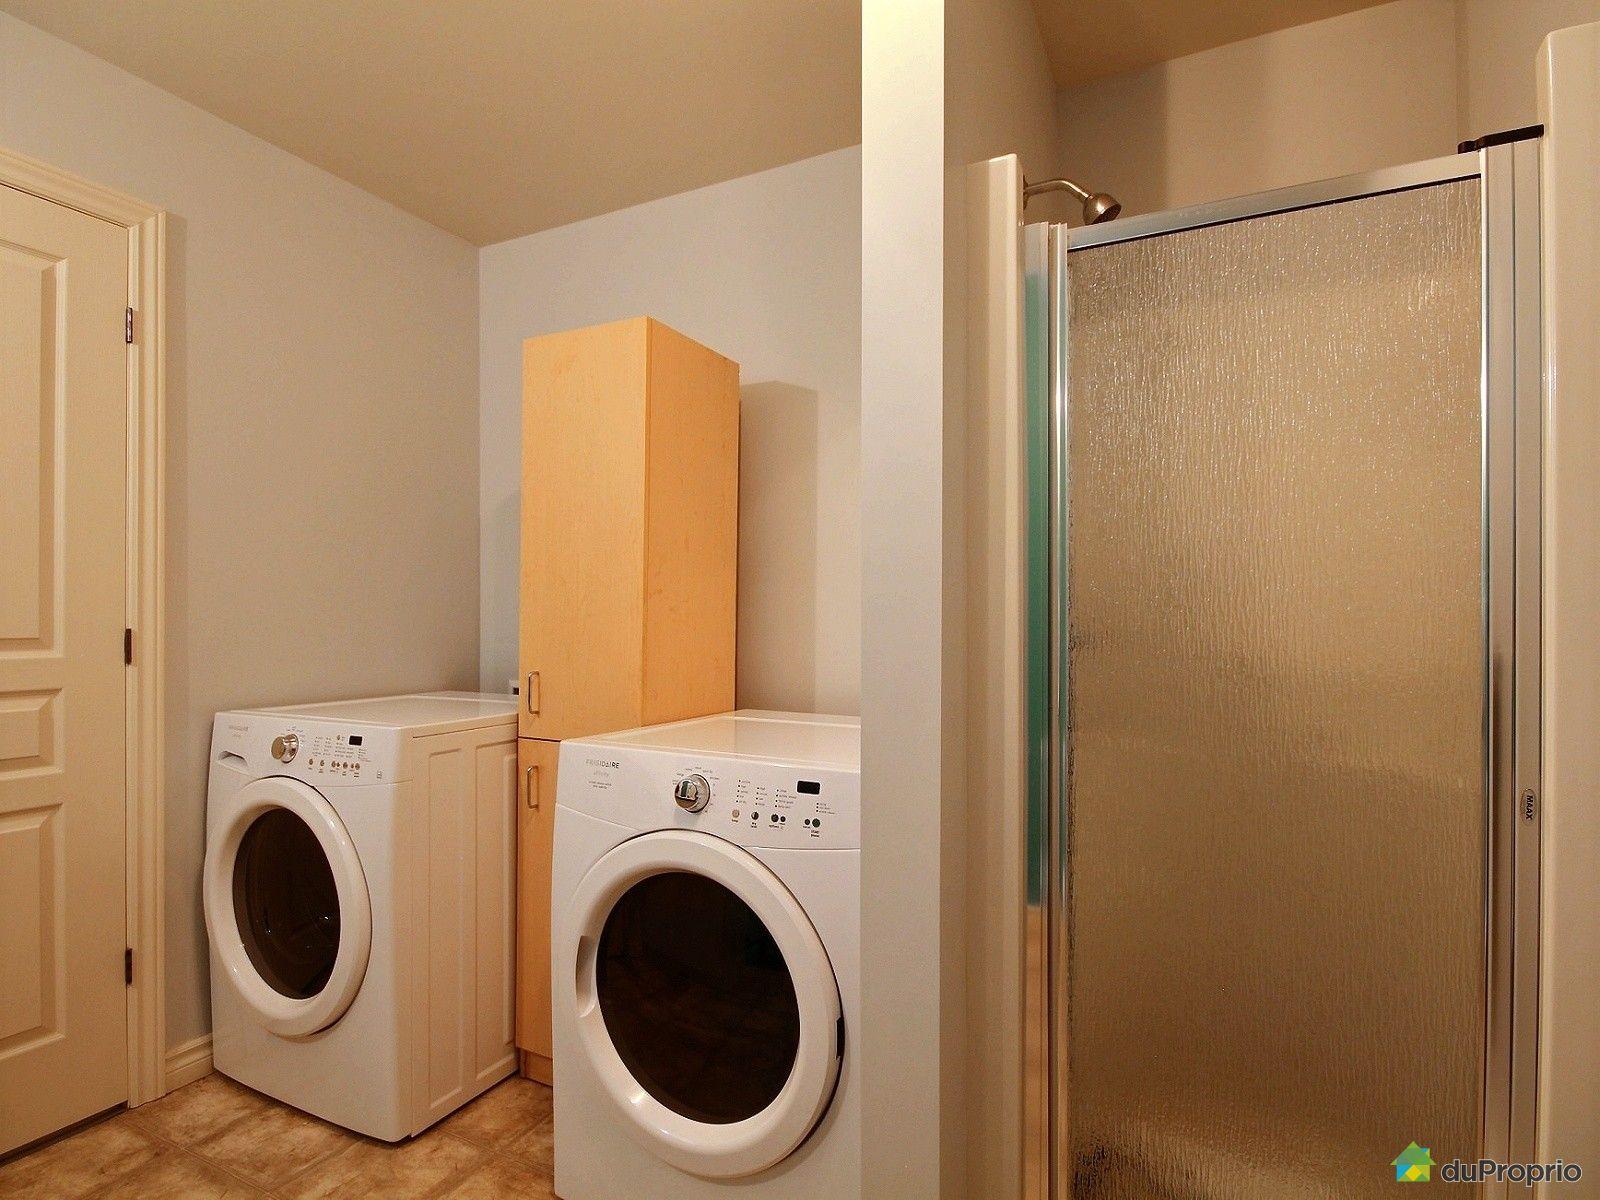 Jumel vendu sherbrooke immobilier qu bec duproprio for Luminosite salle de bain sans fenetre